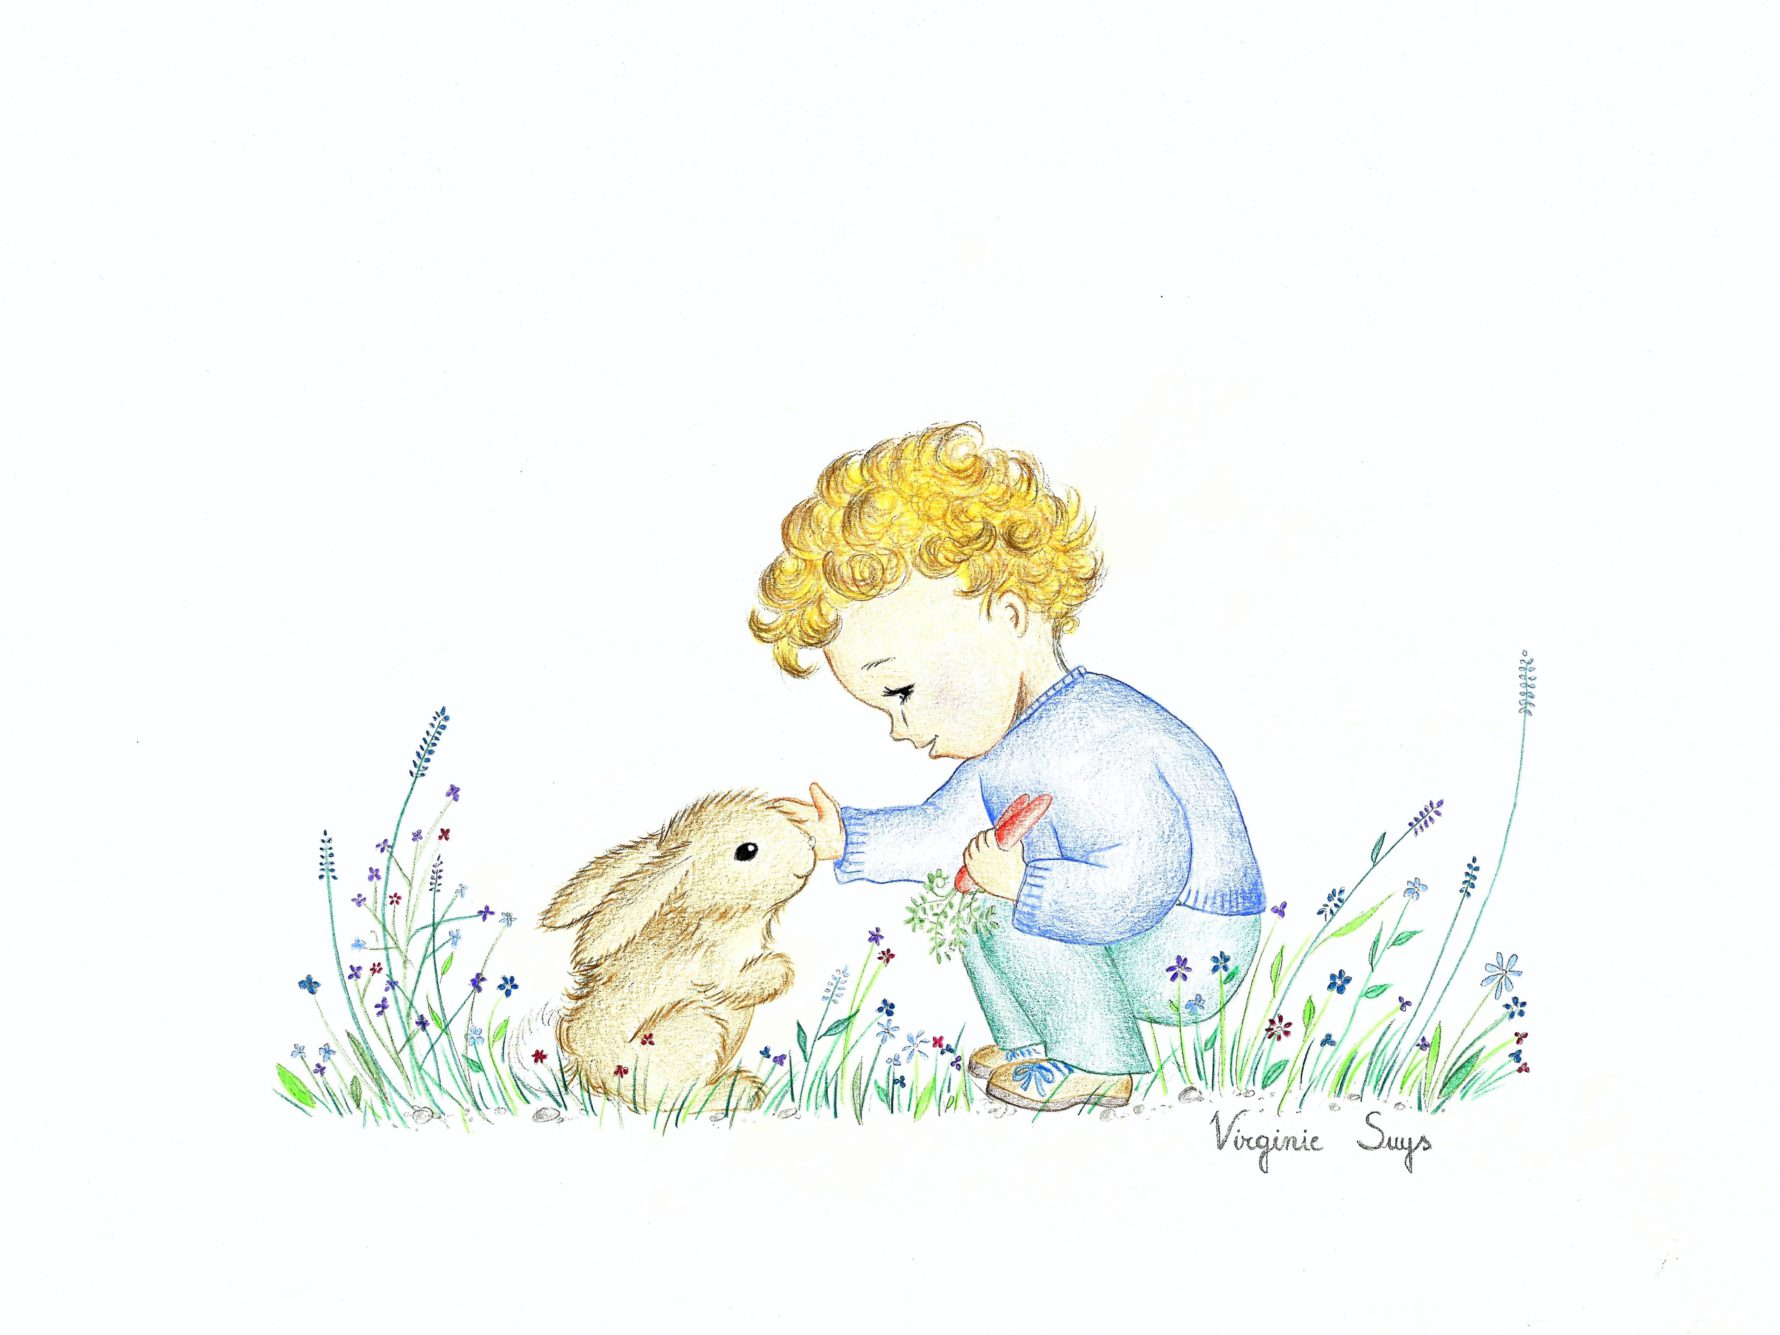 Virginie Suys Boy with rabbit in blue & green illustration